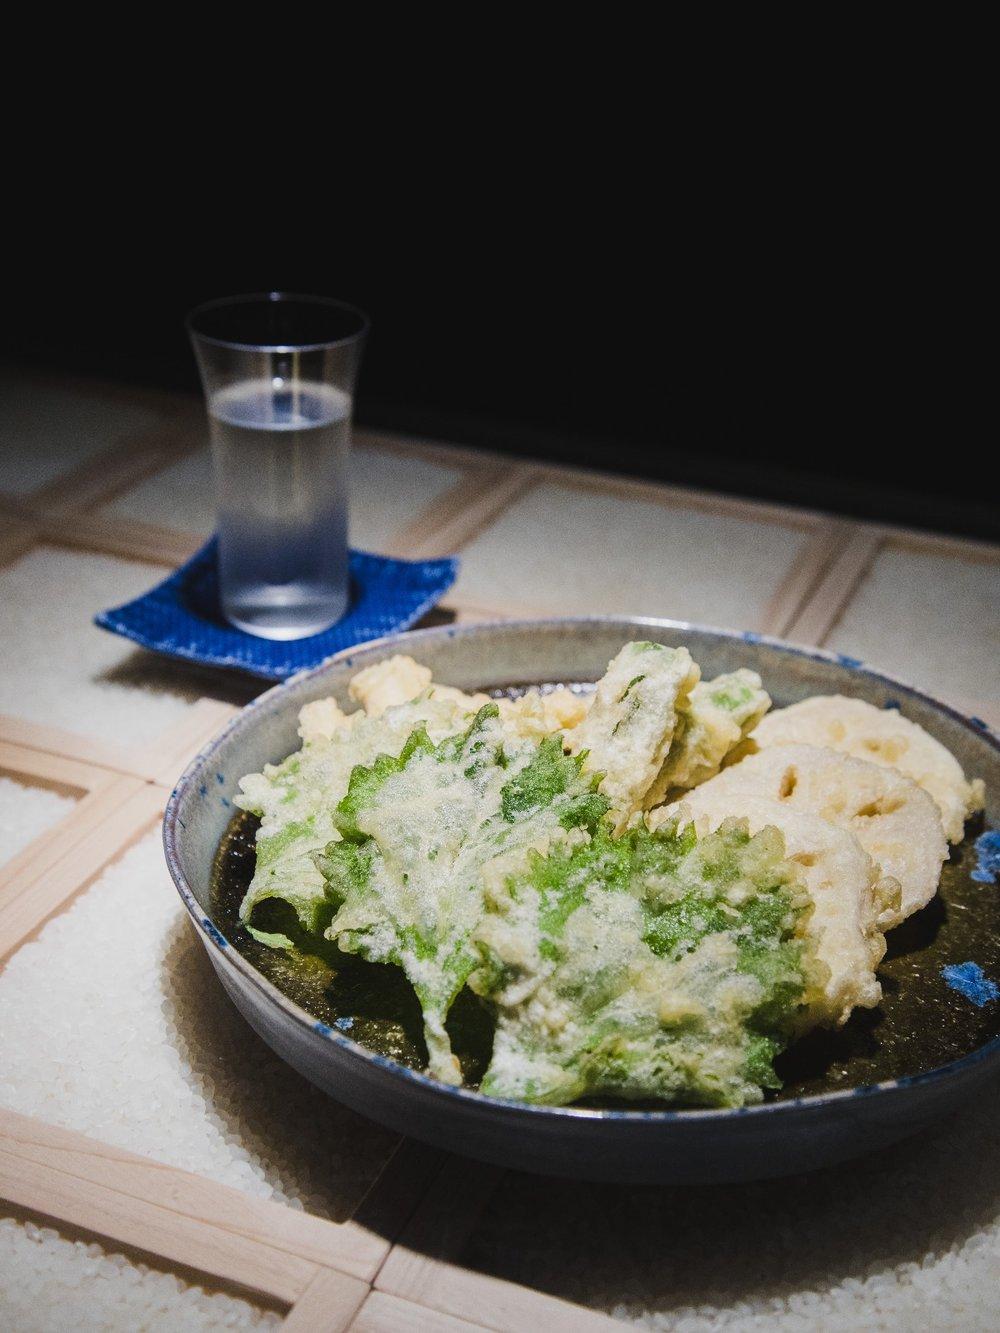 Bespoke chef's tableware